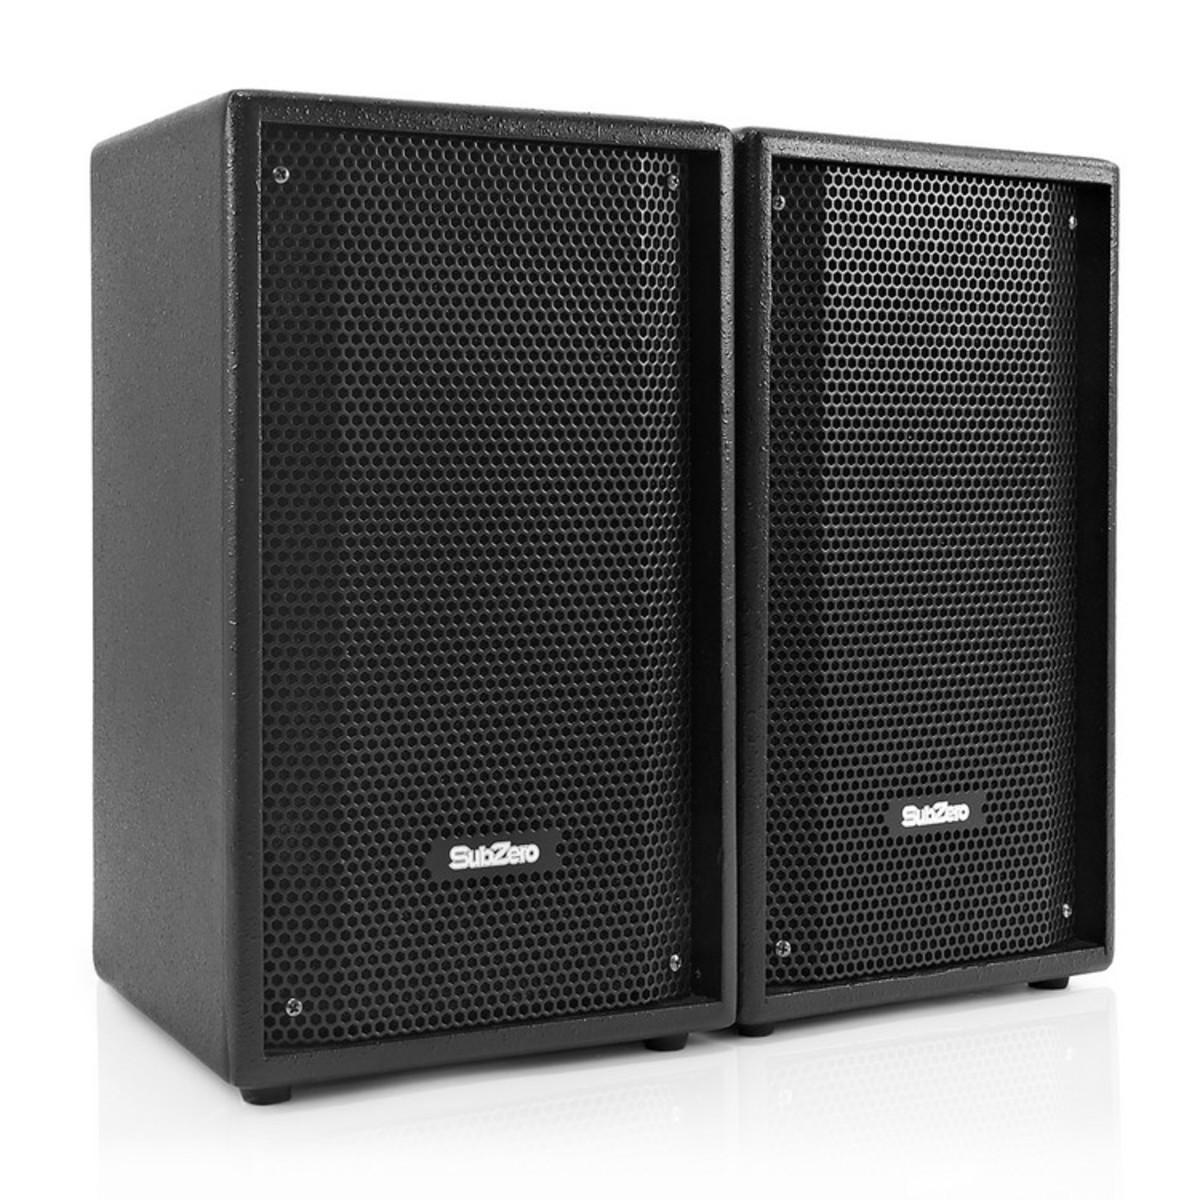 Subzero 8 Passive Satelliten Lautsprecher Von Gear4music Paar